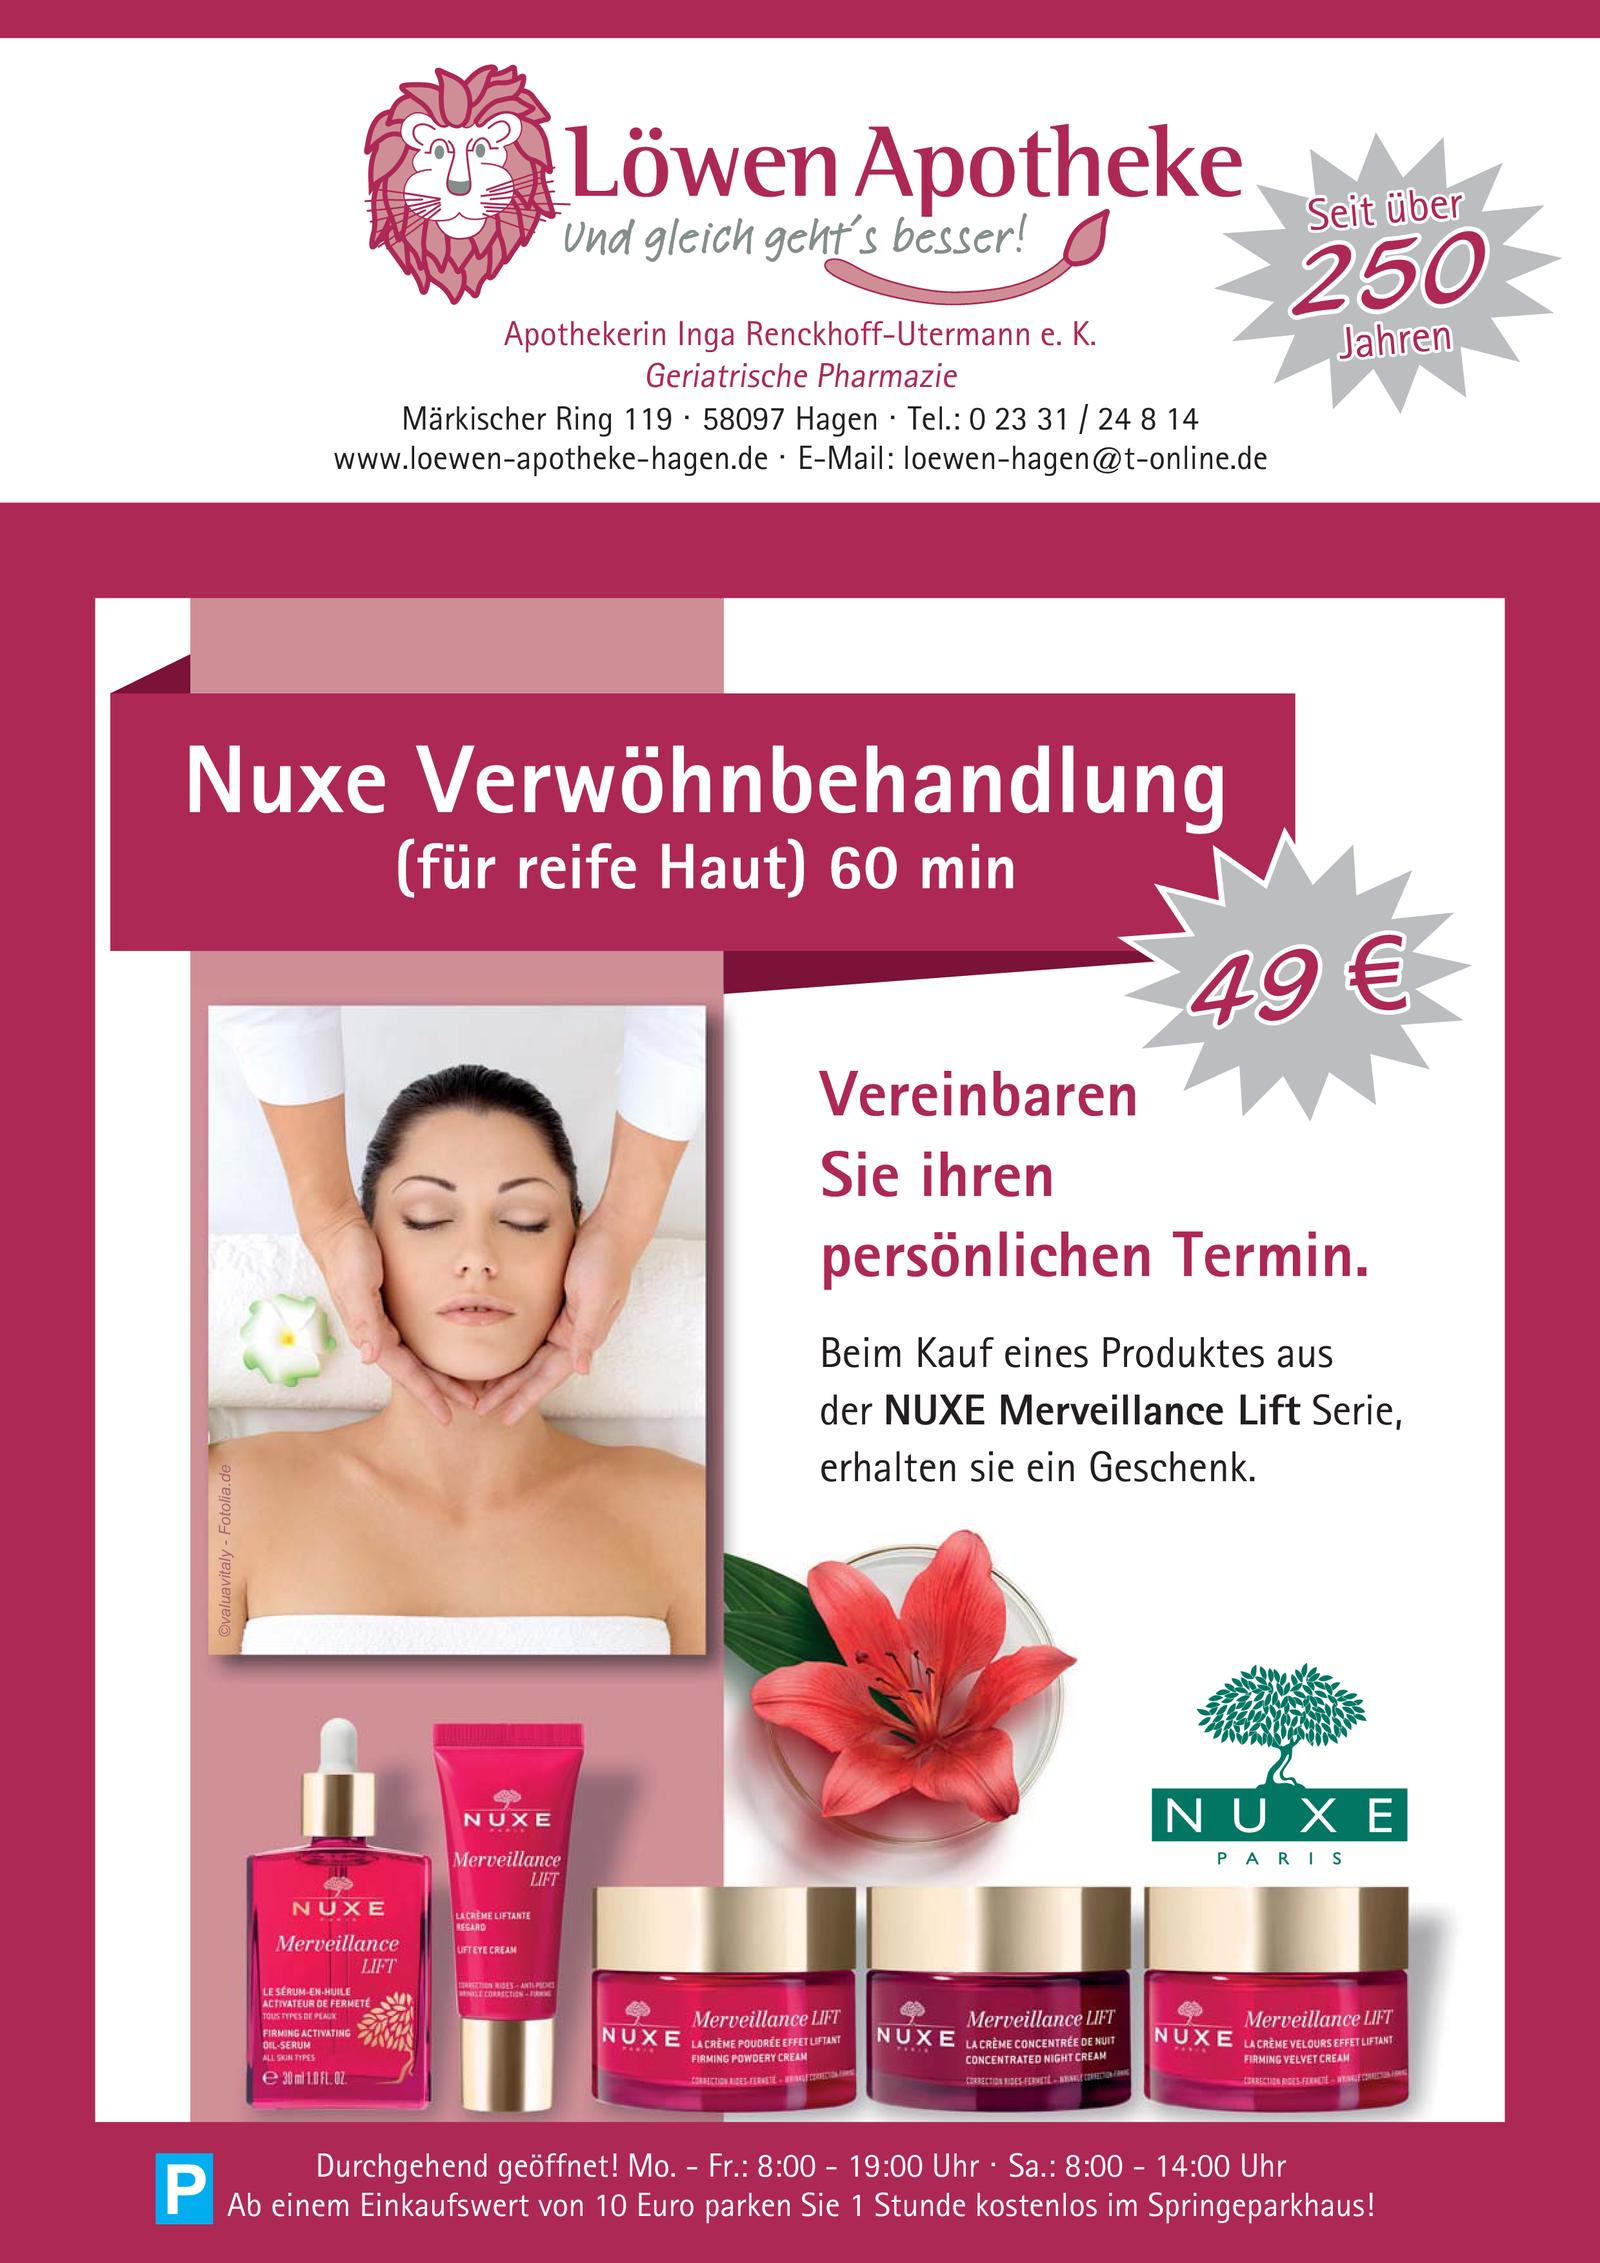 https://mein-uploads.apocdn.net/20524/leaflets/20524_flyer-Seite2.png